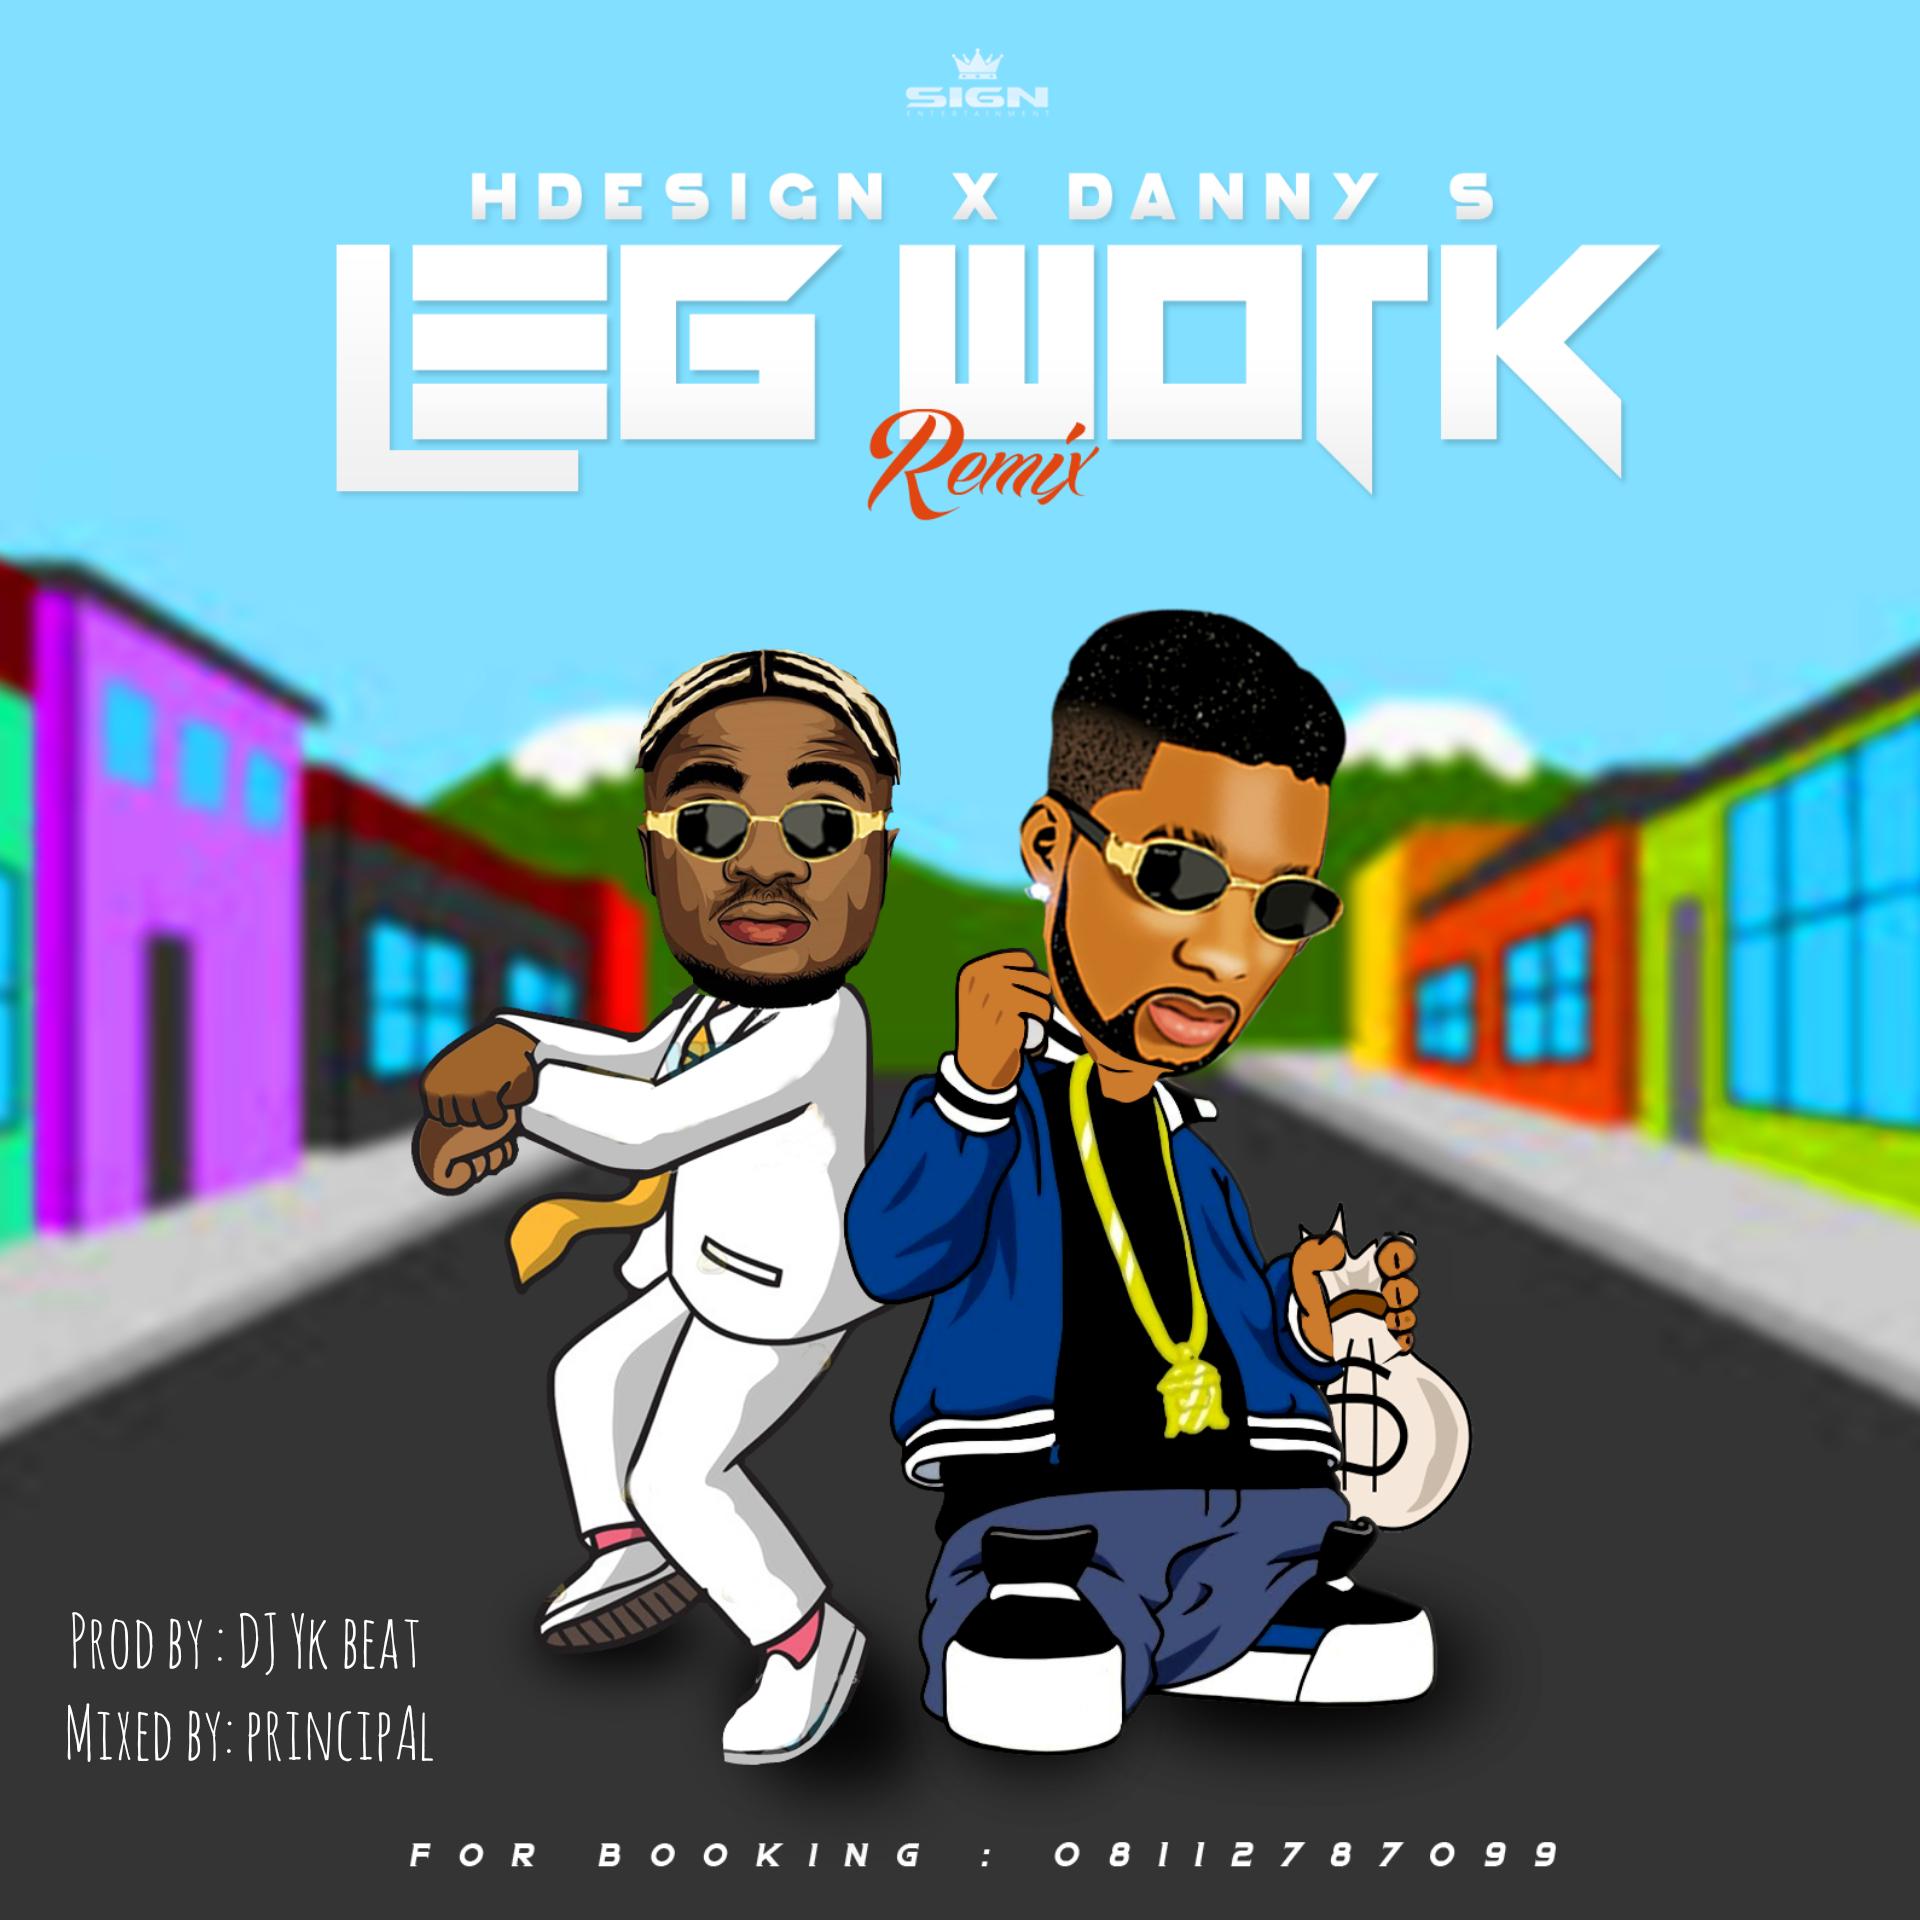 Music:HDesign Ft. Danny S – Legwork Remix